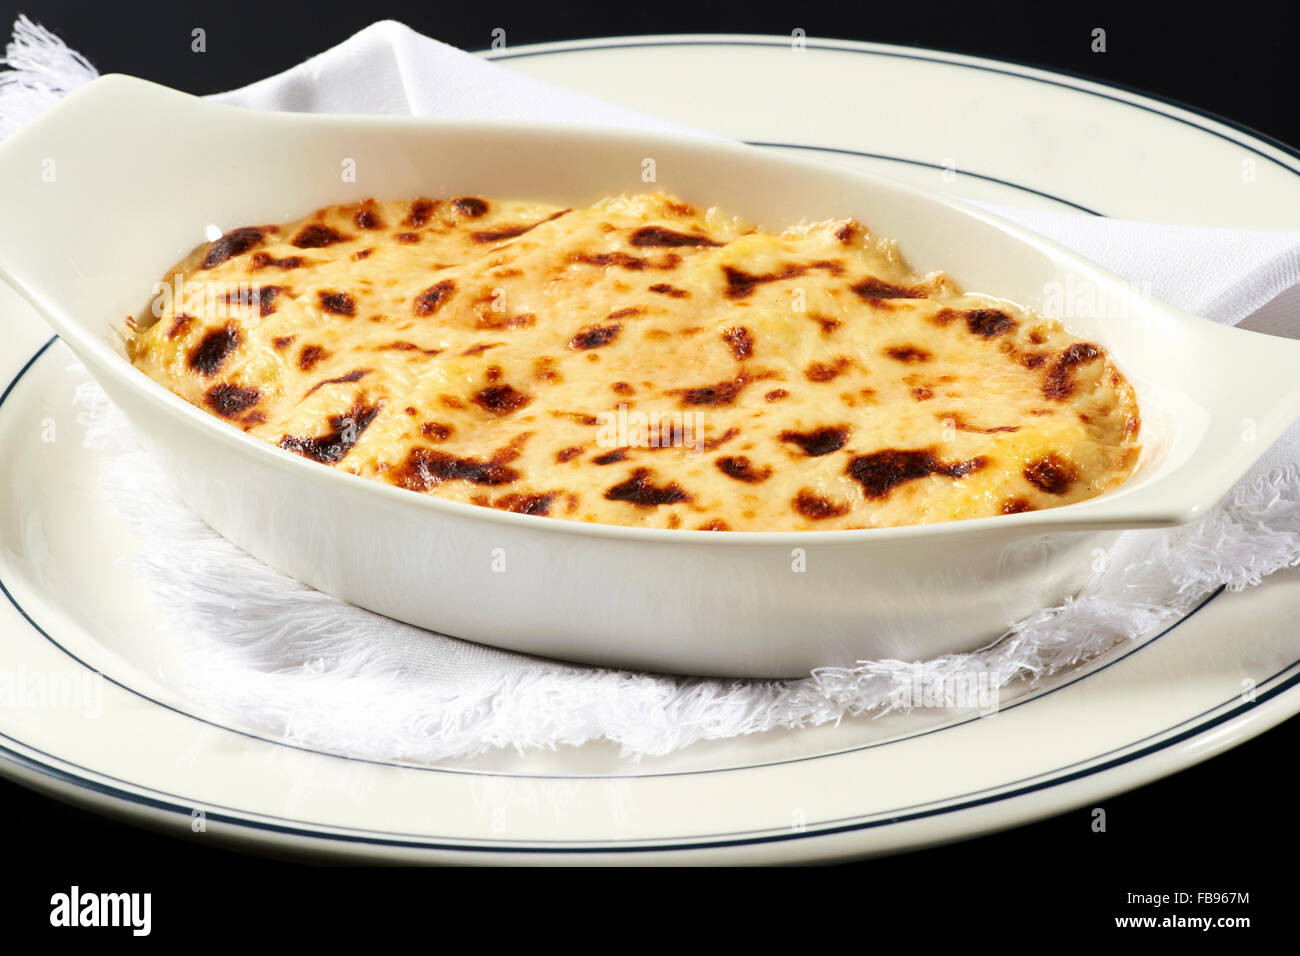 Bowl of traditional Italian lasagna - Stock Image